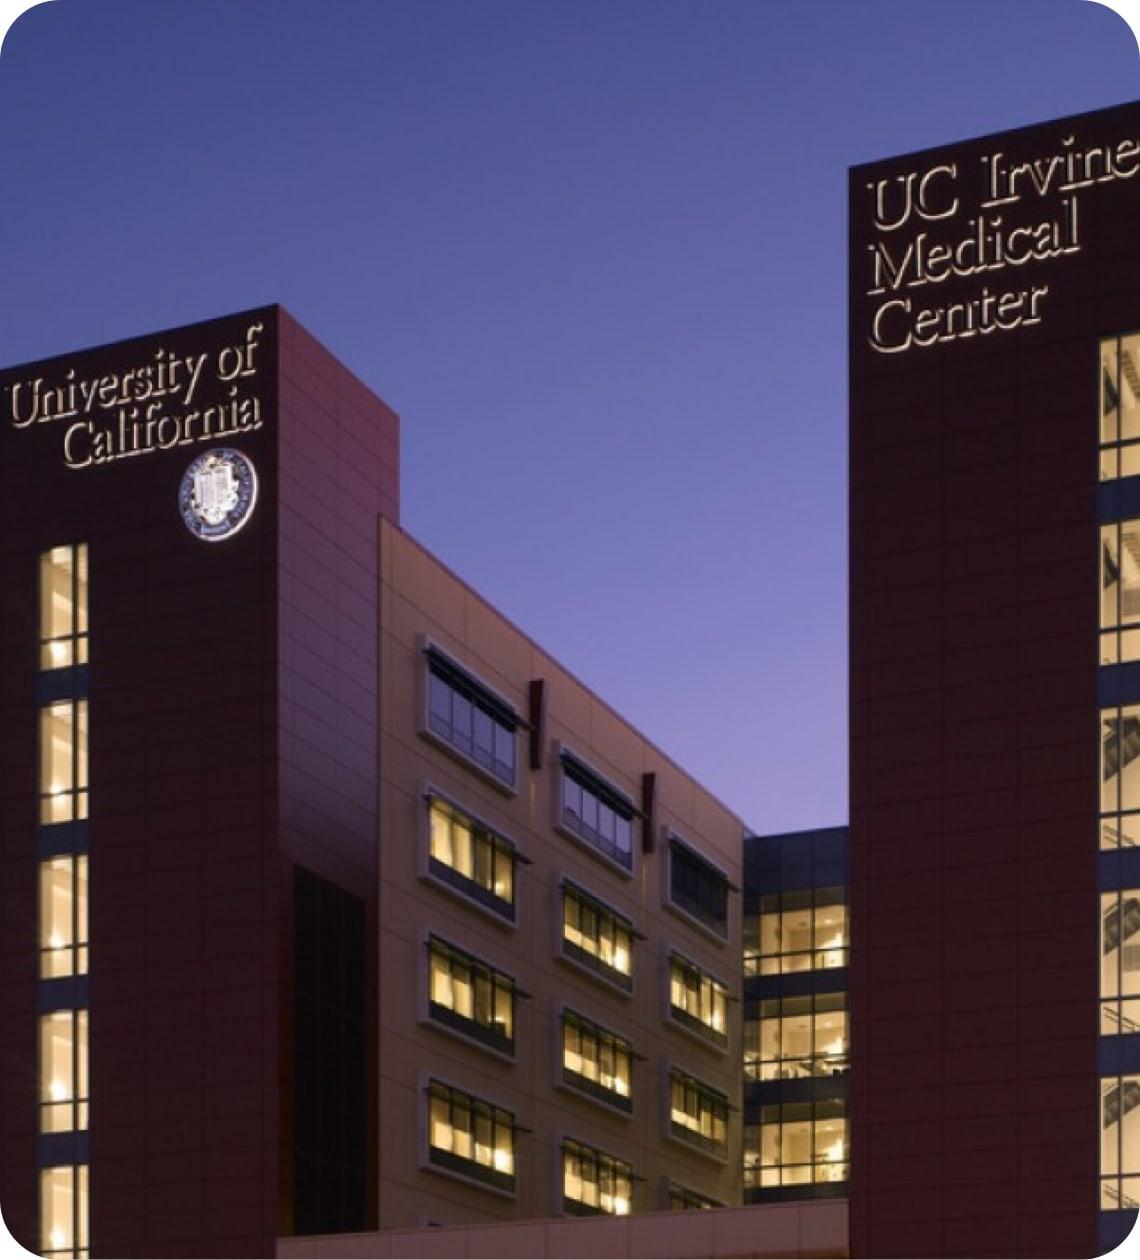 image of University of California Irvine Medical Center